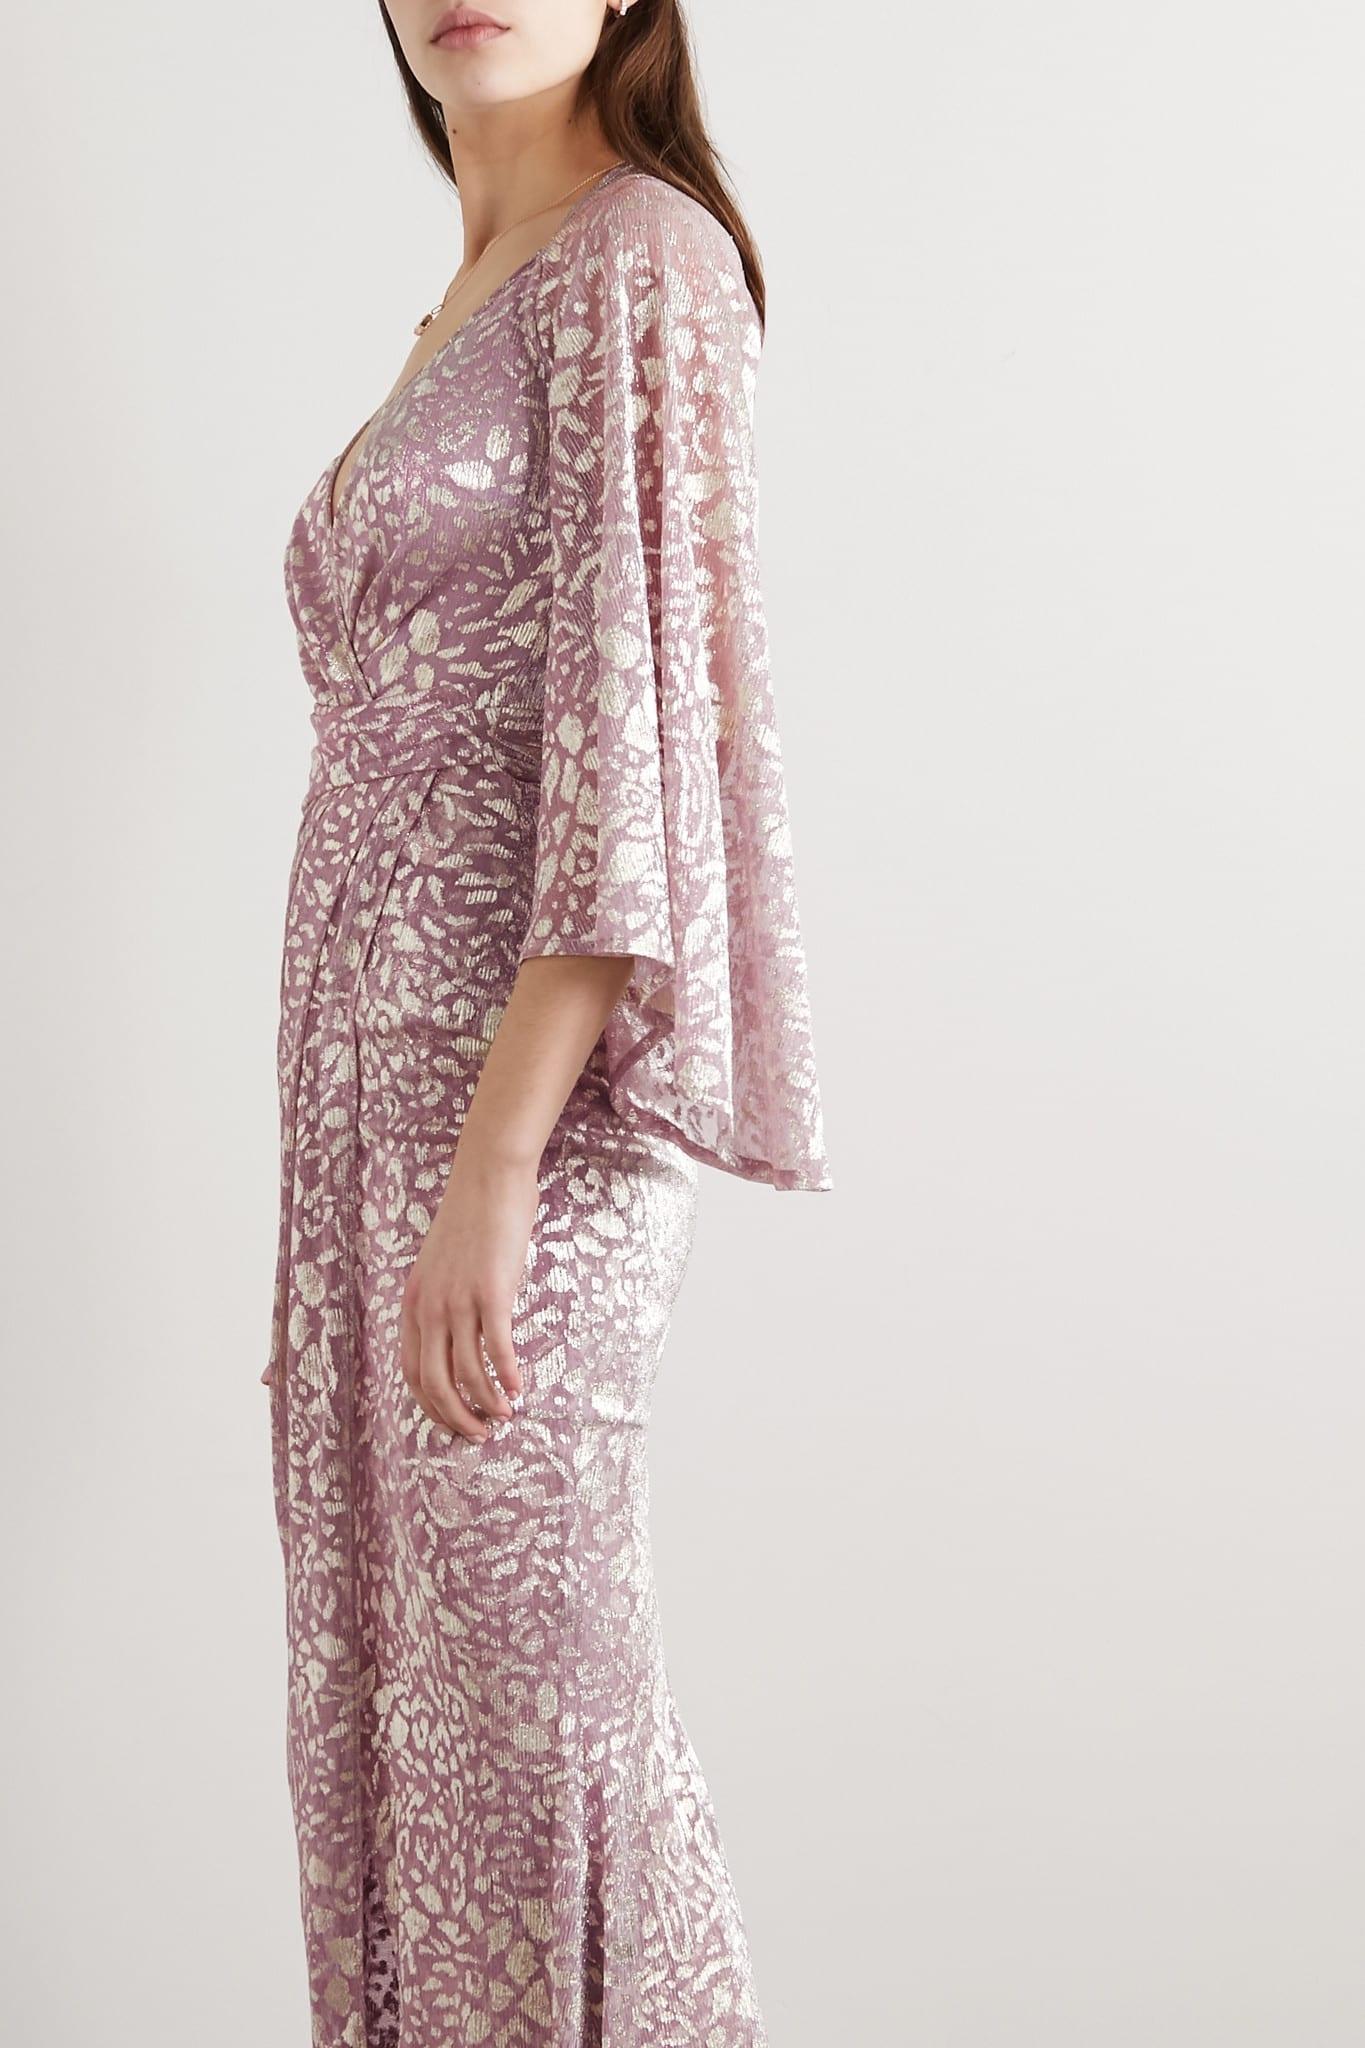 TALBOT RUNHOF Bologne Metallic Leopard-jacquard Voile Gown